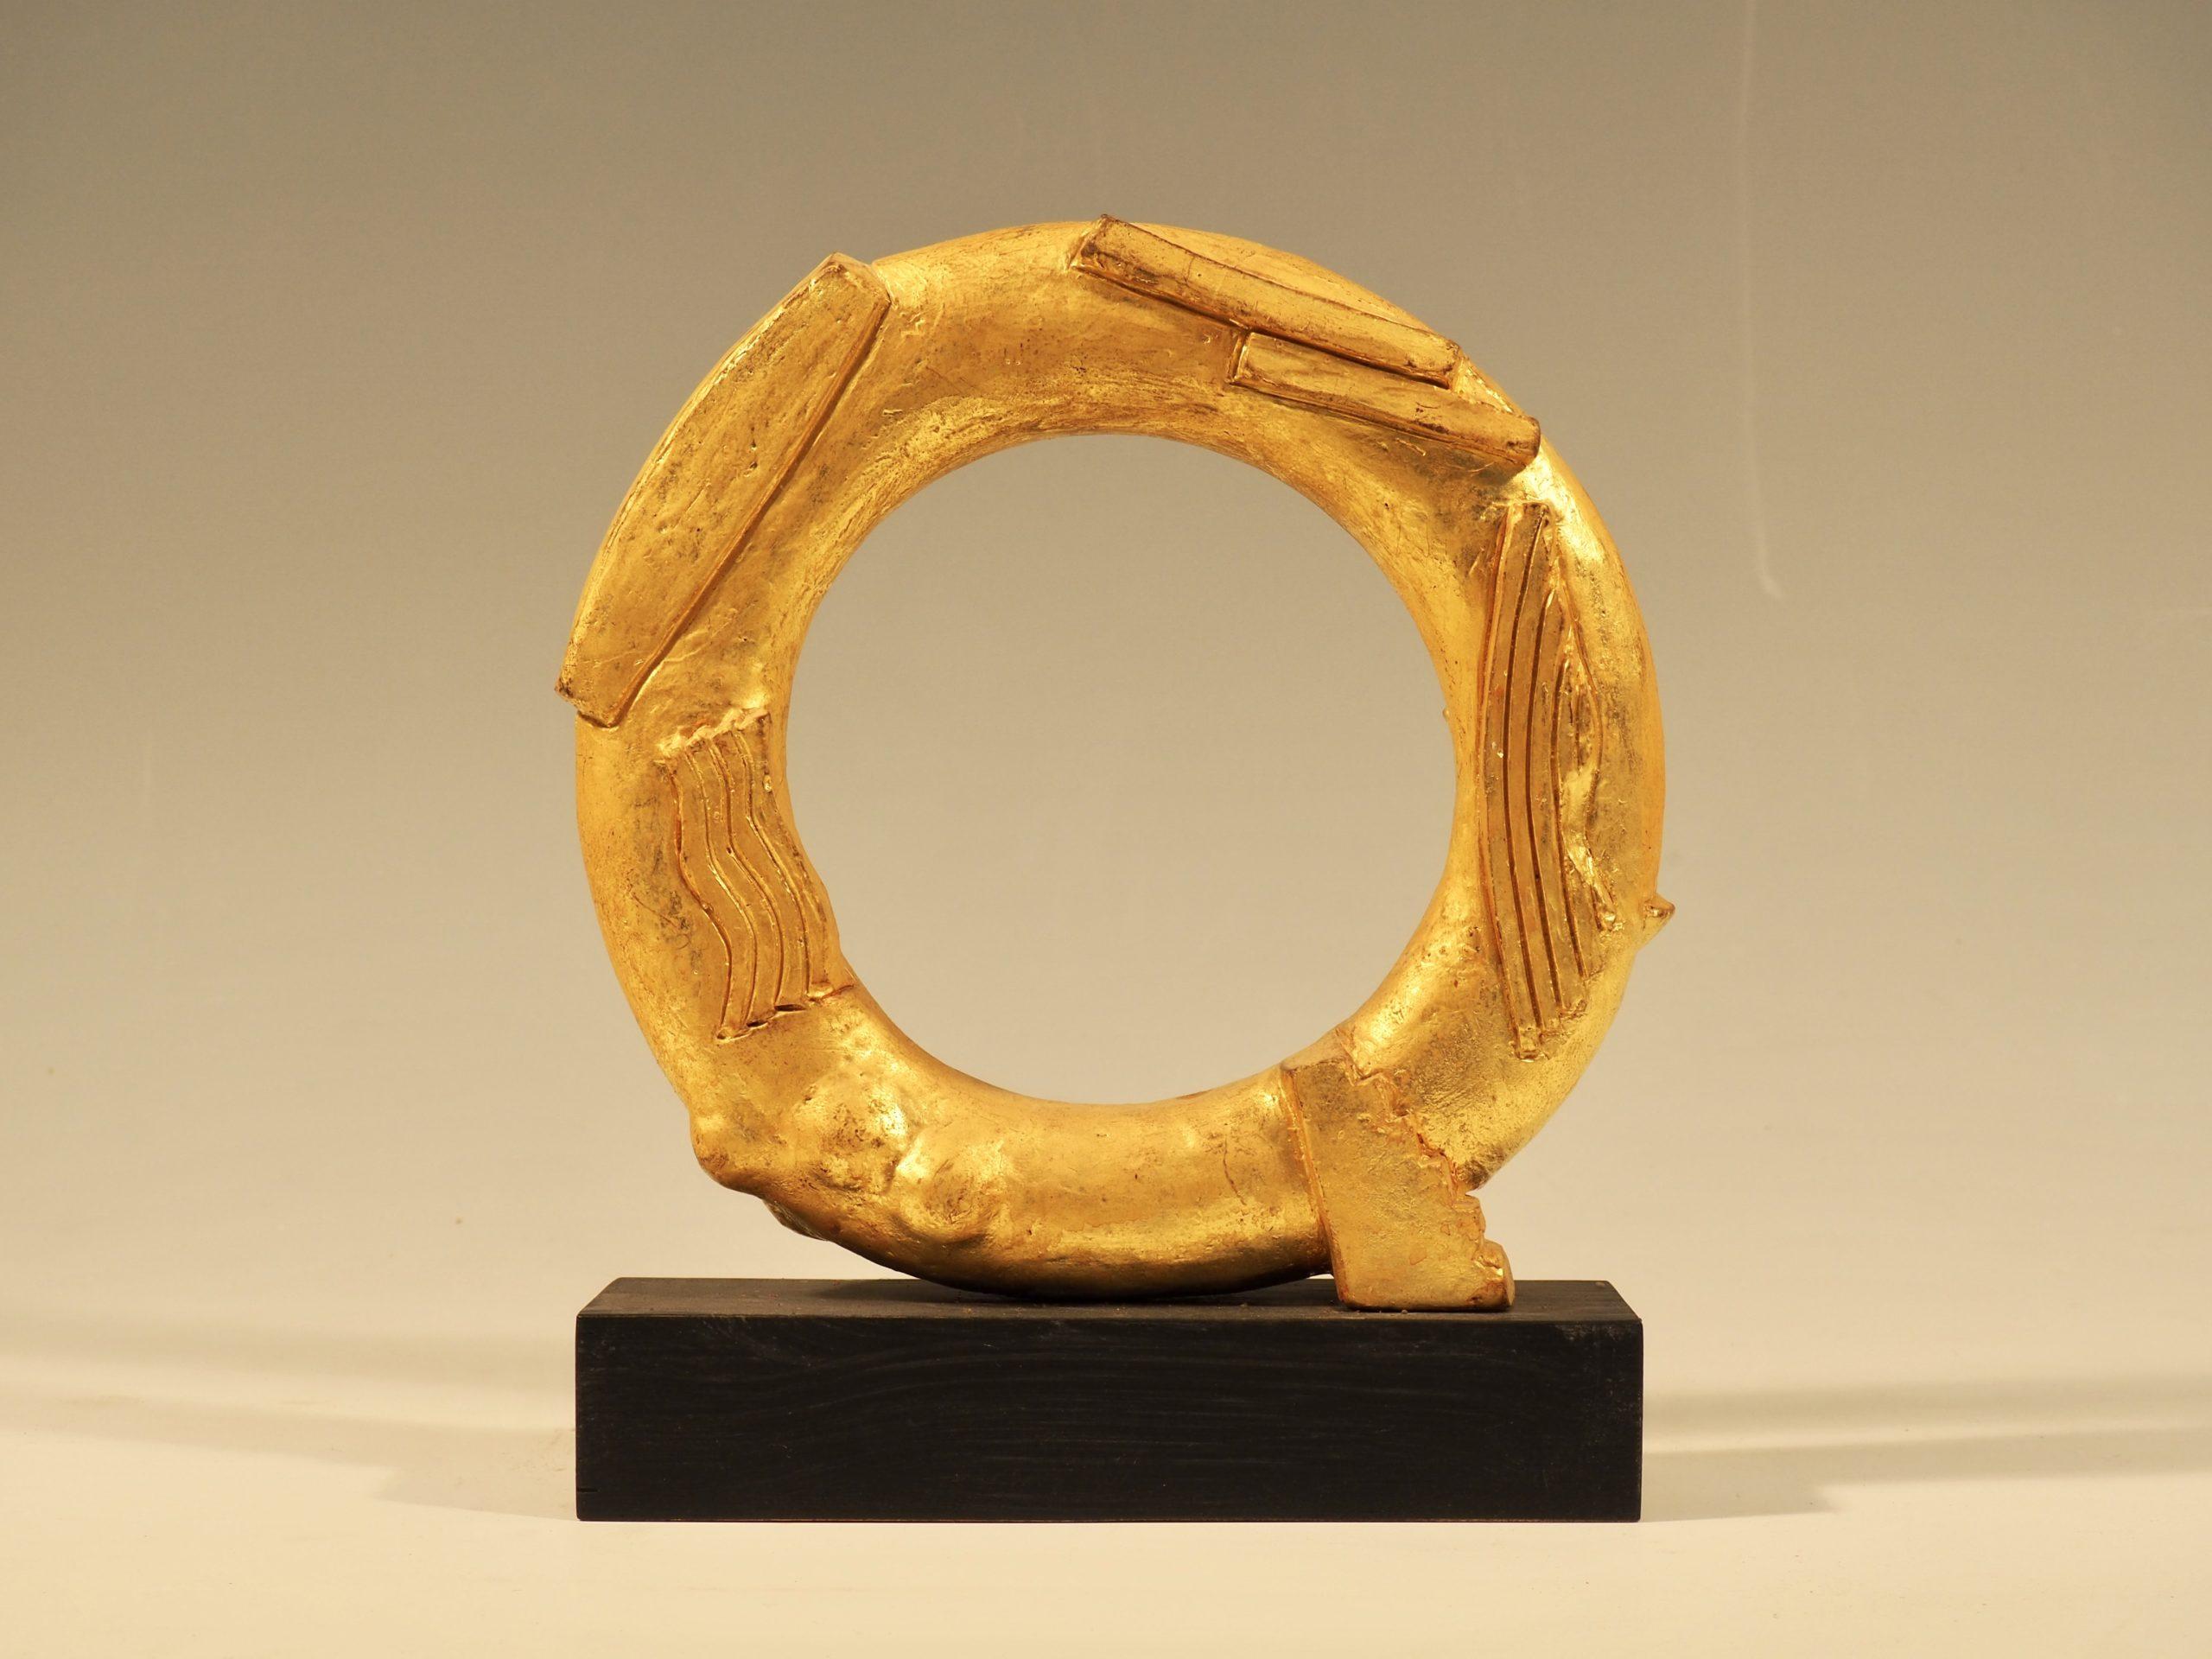 Gylden ring, Gips med bladguld, 21x21x4.5 cm, Pris 7.000 Kr.